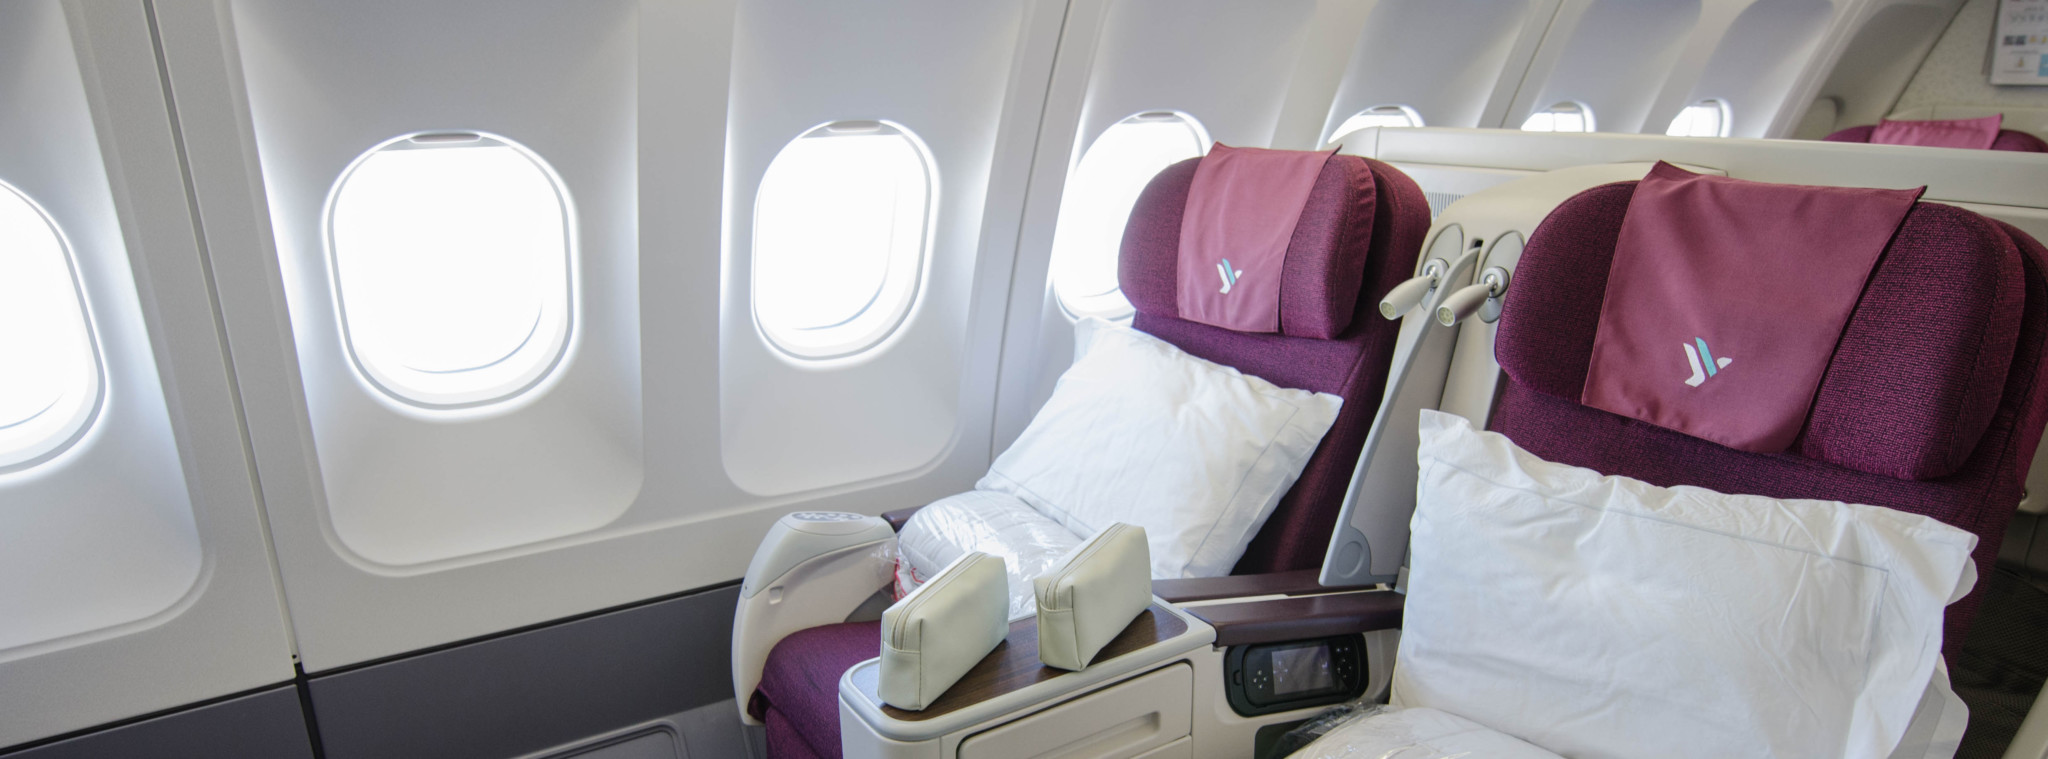 Air Italy Erfahrungen